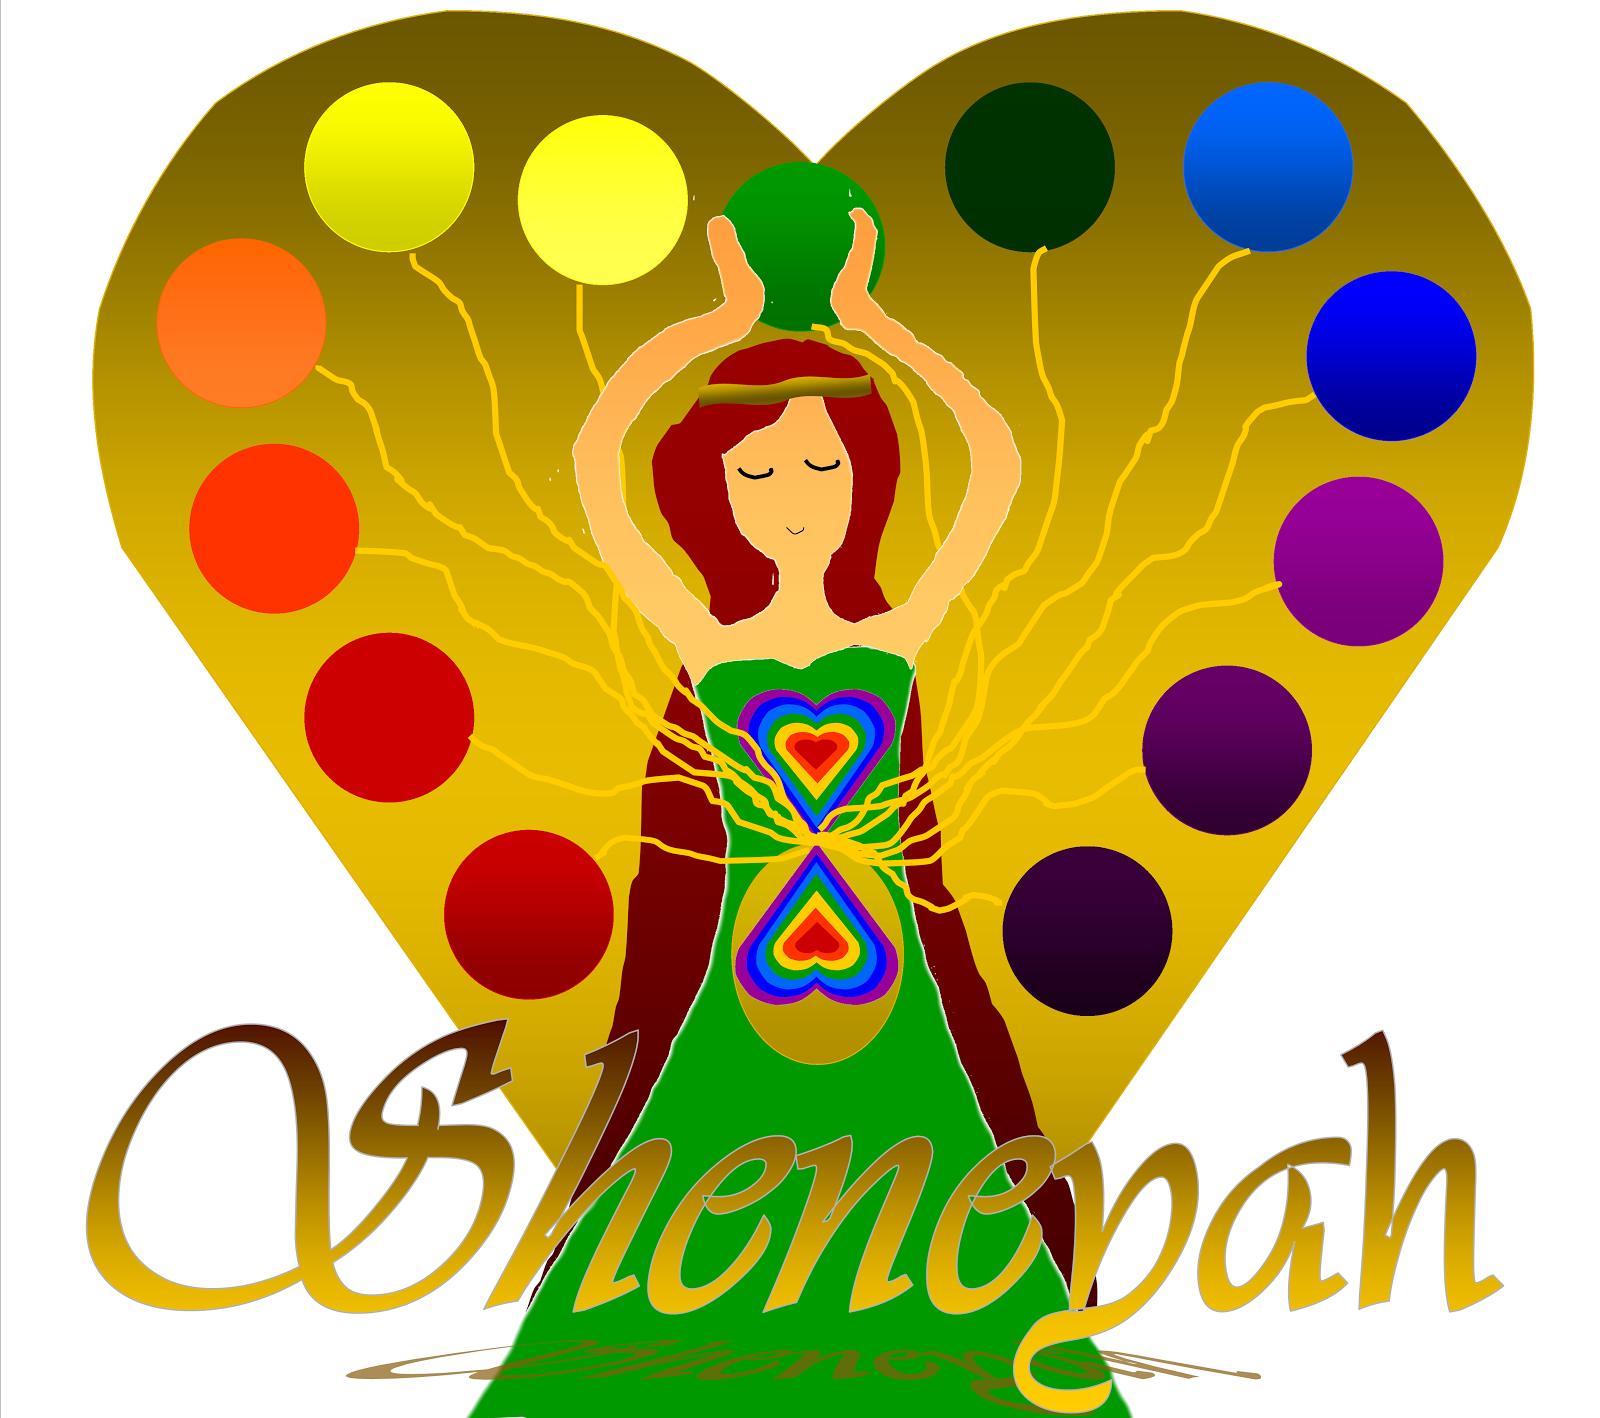 Sheneyah